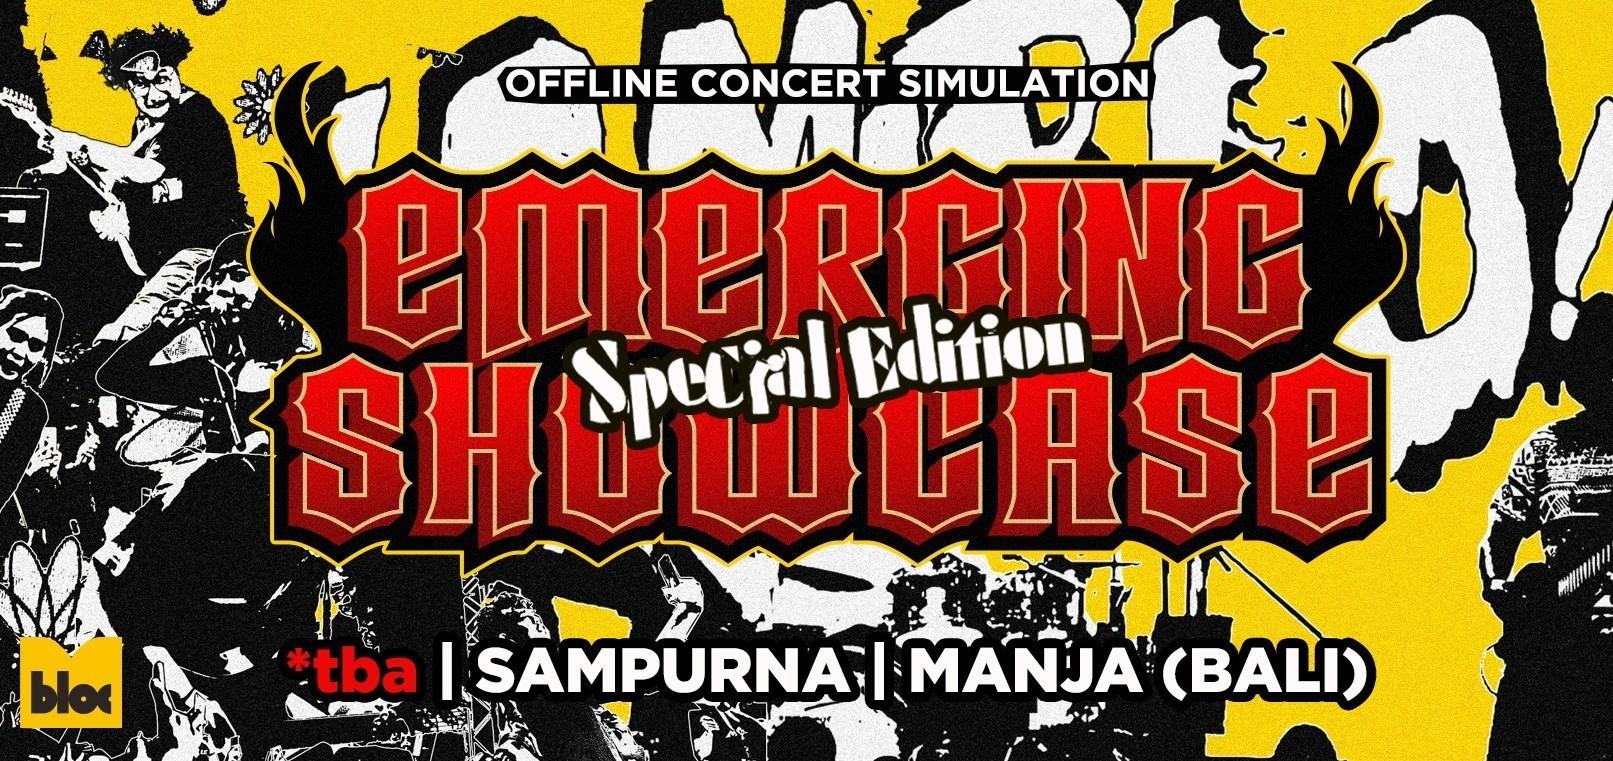 Offline Concert Simulation: Emerging Showcase - Special Edition [MANJA]